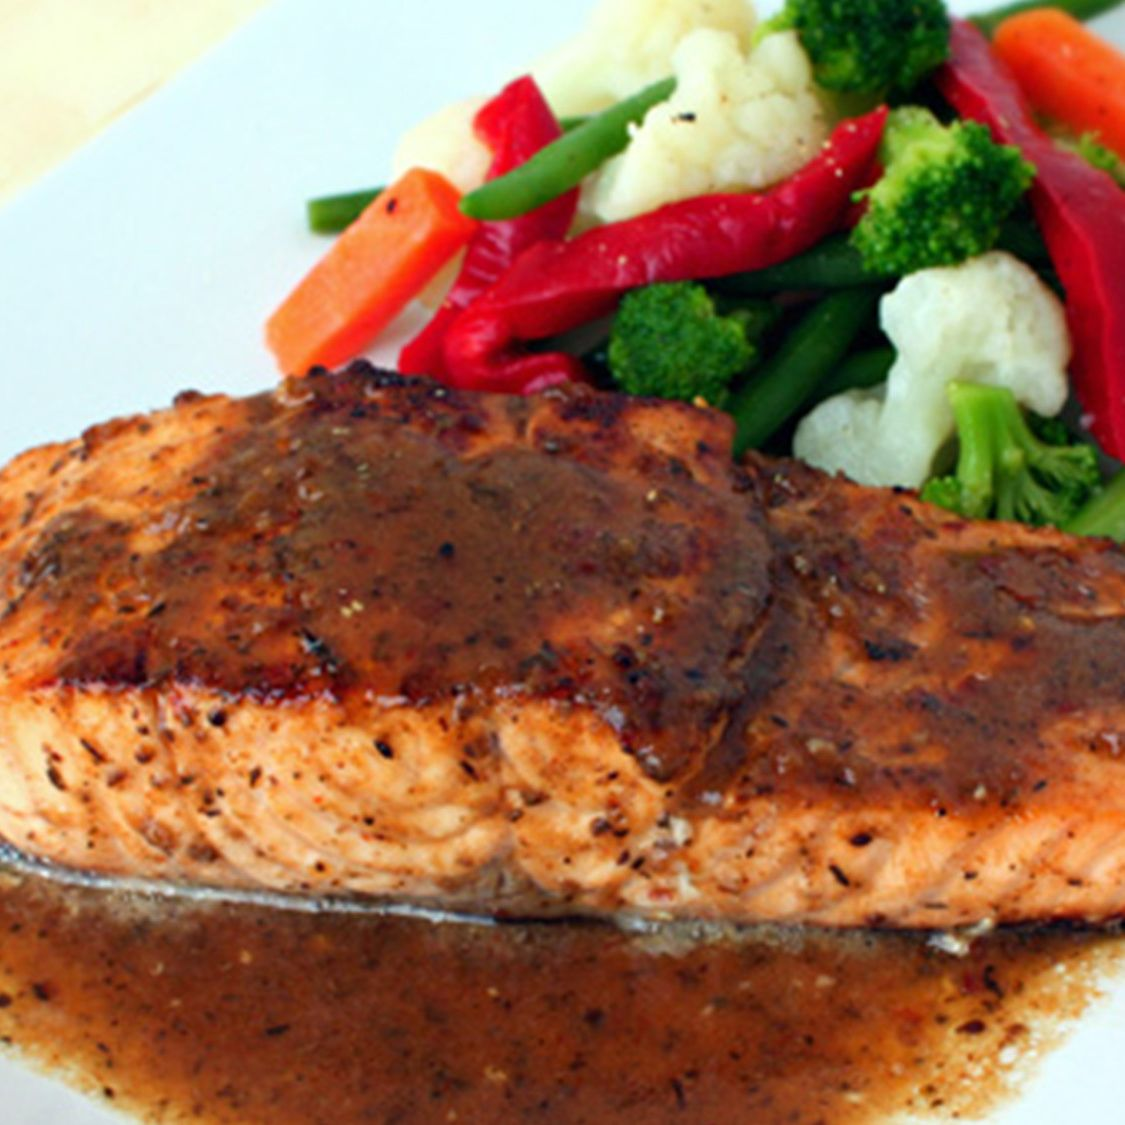 marinated_panroasted_salmon_with_steamed_seasonal_vegetables.jpg